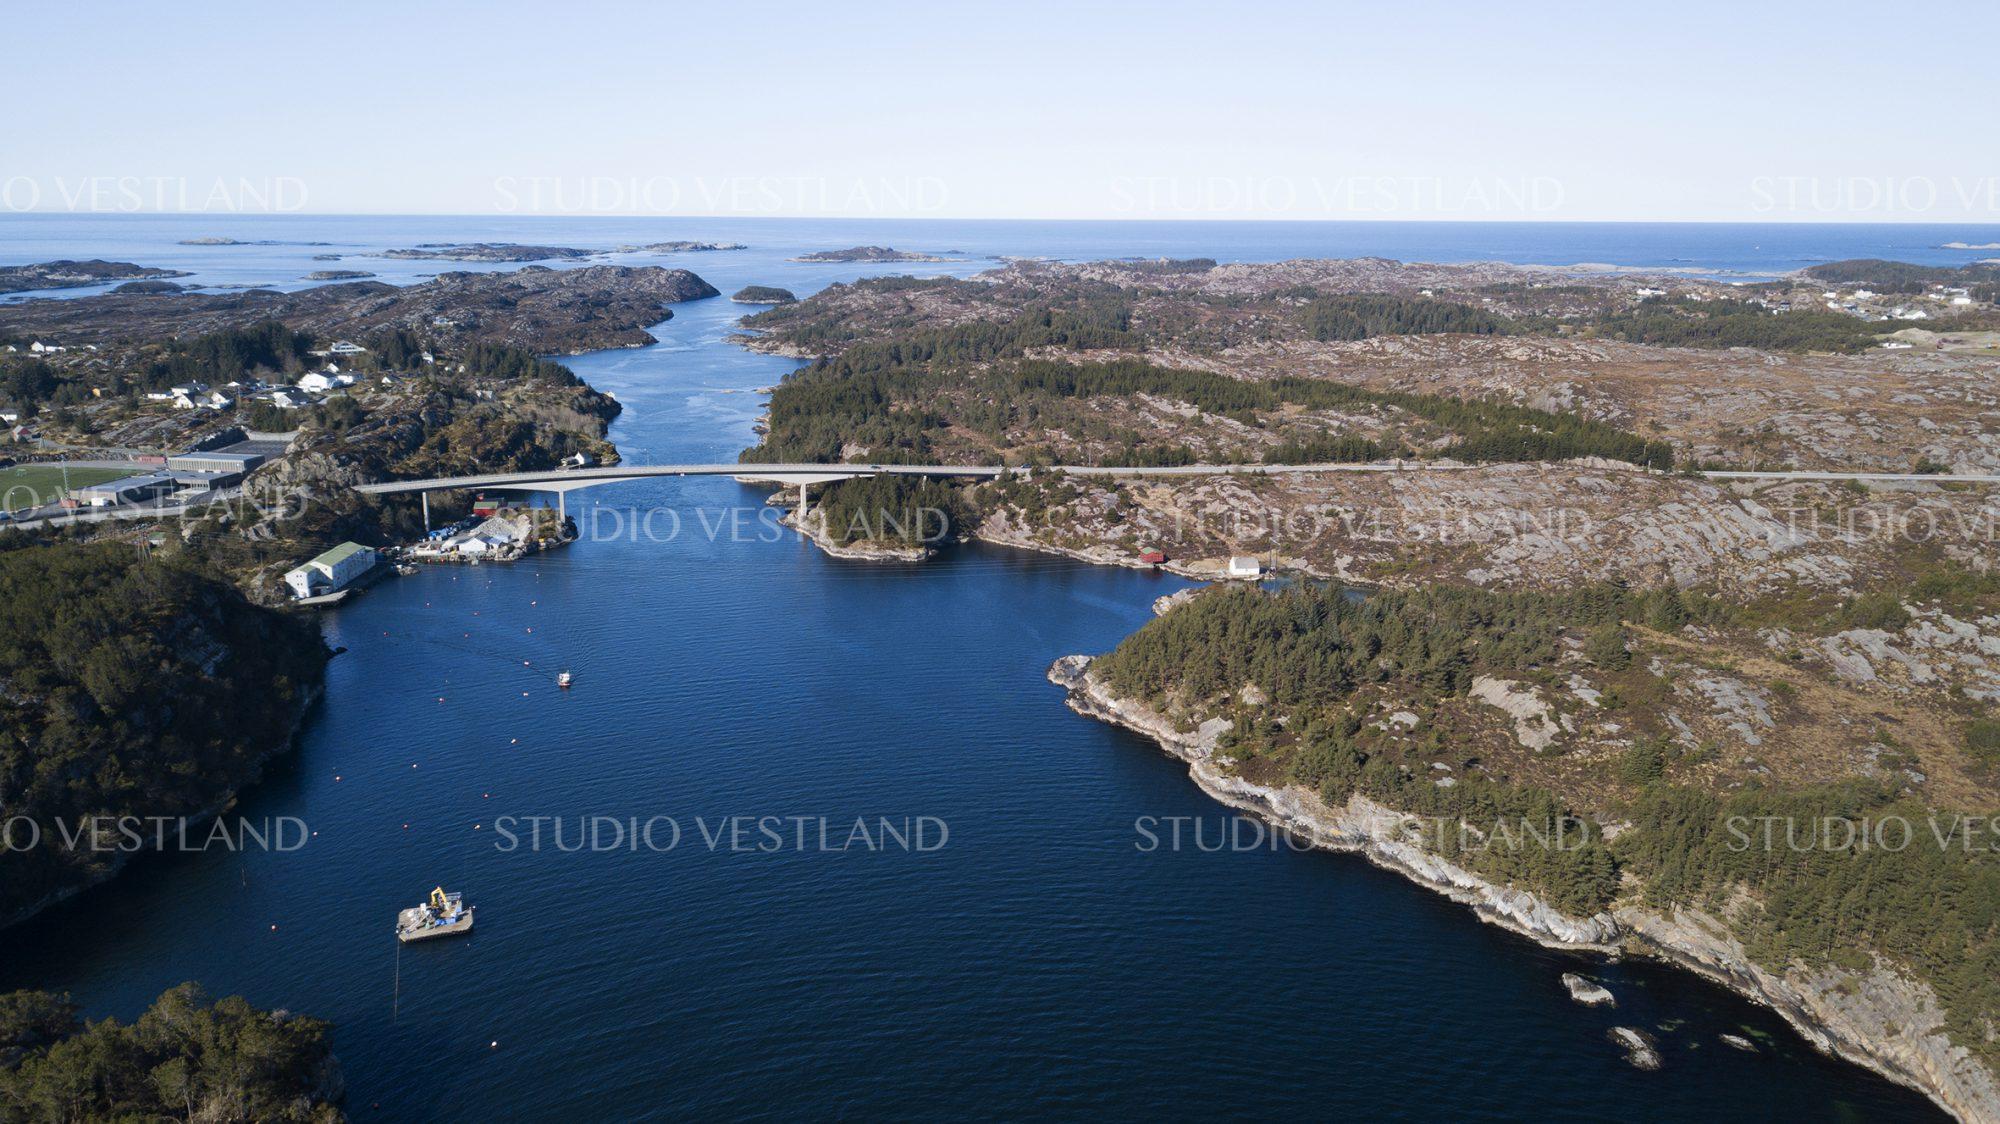 Studio Vestland - Rongesund bru 3